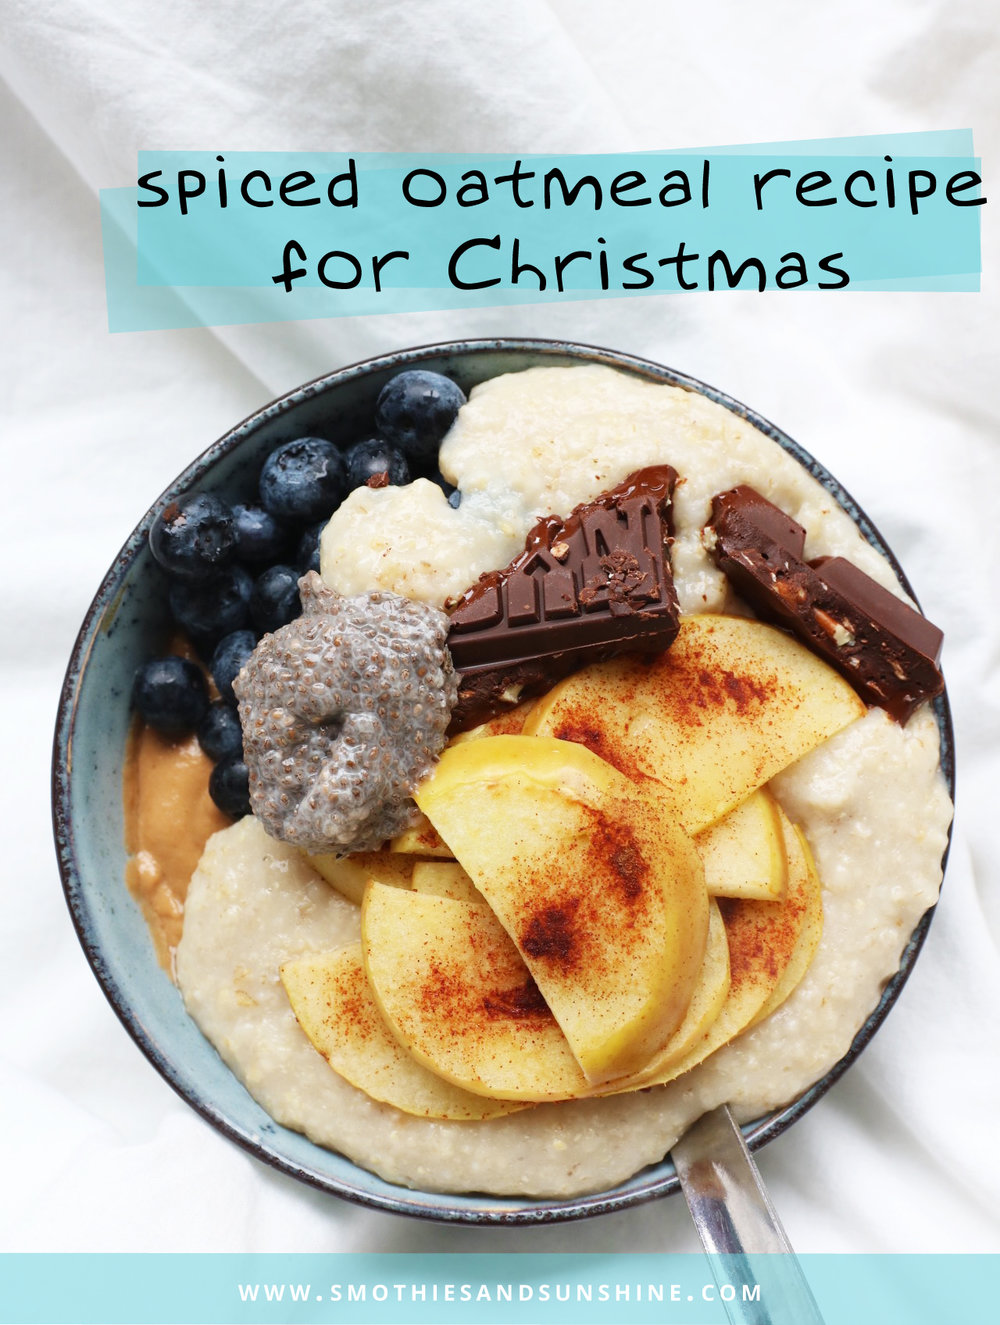 spiced-oatmeal-recipe-for-christmas.jpg